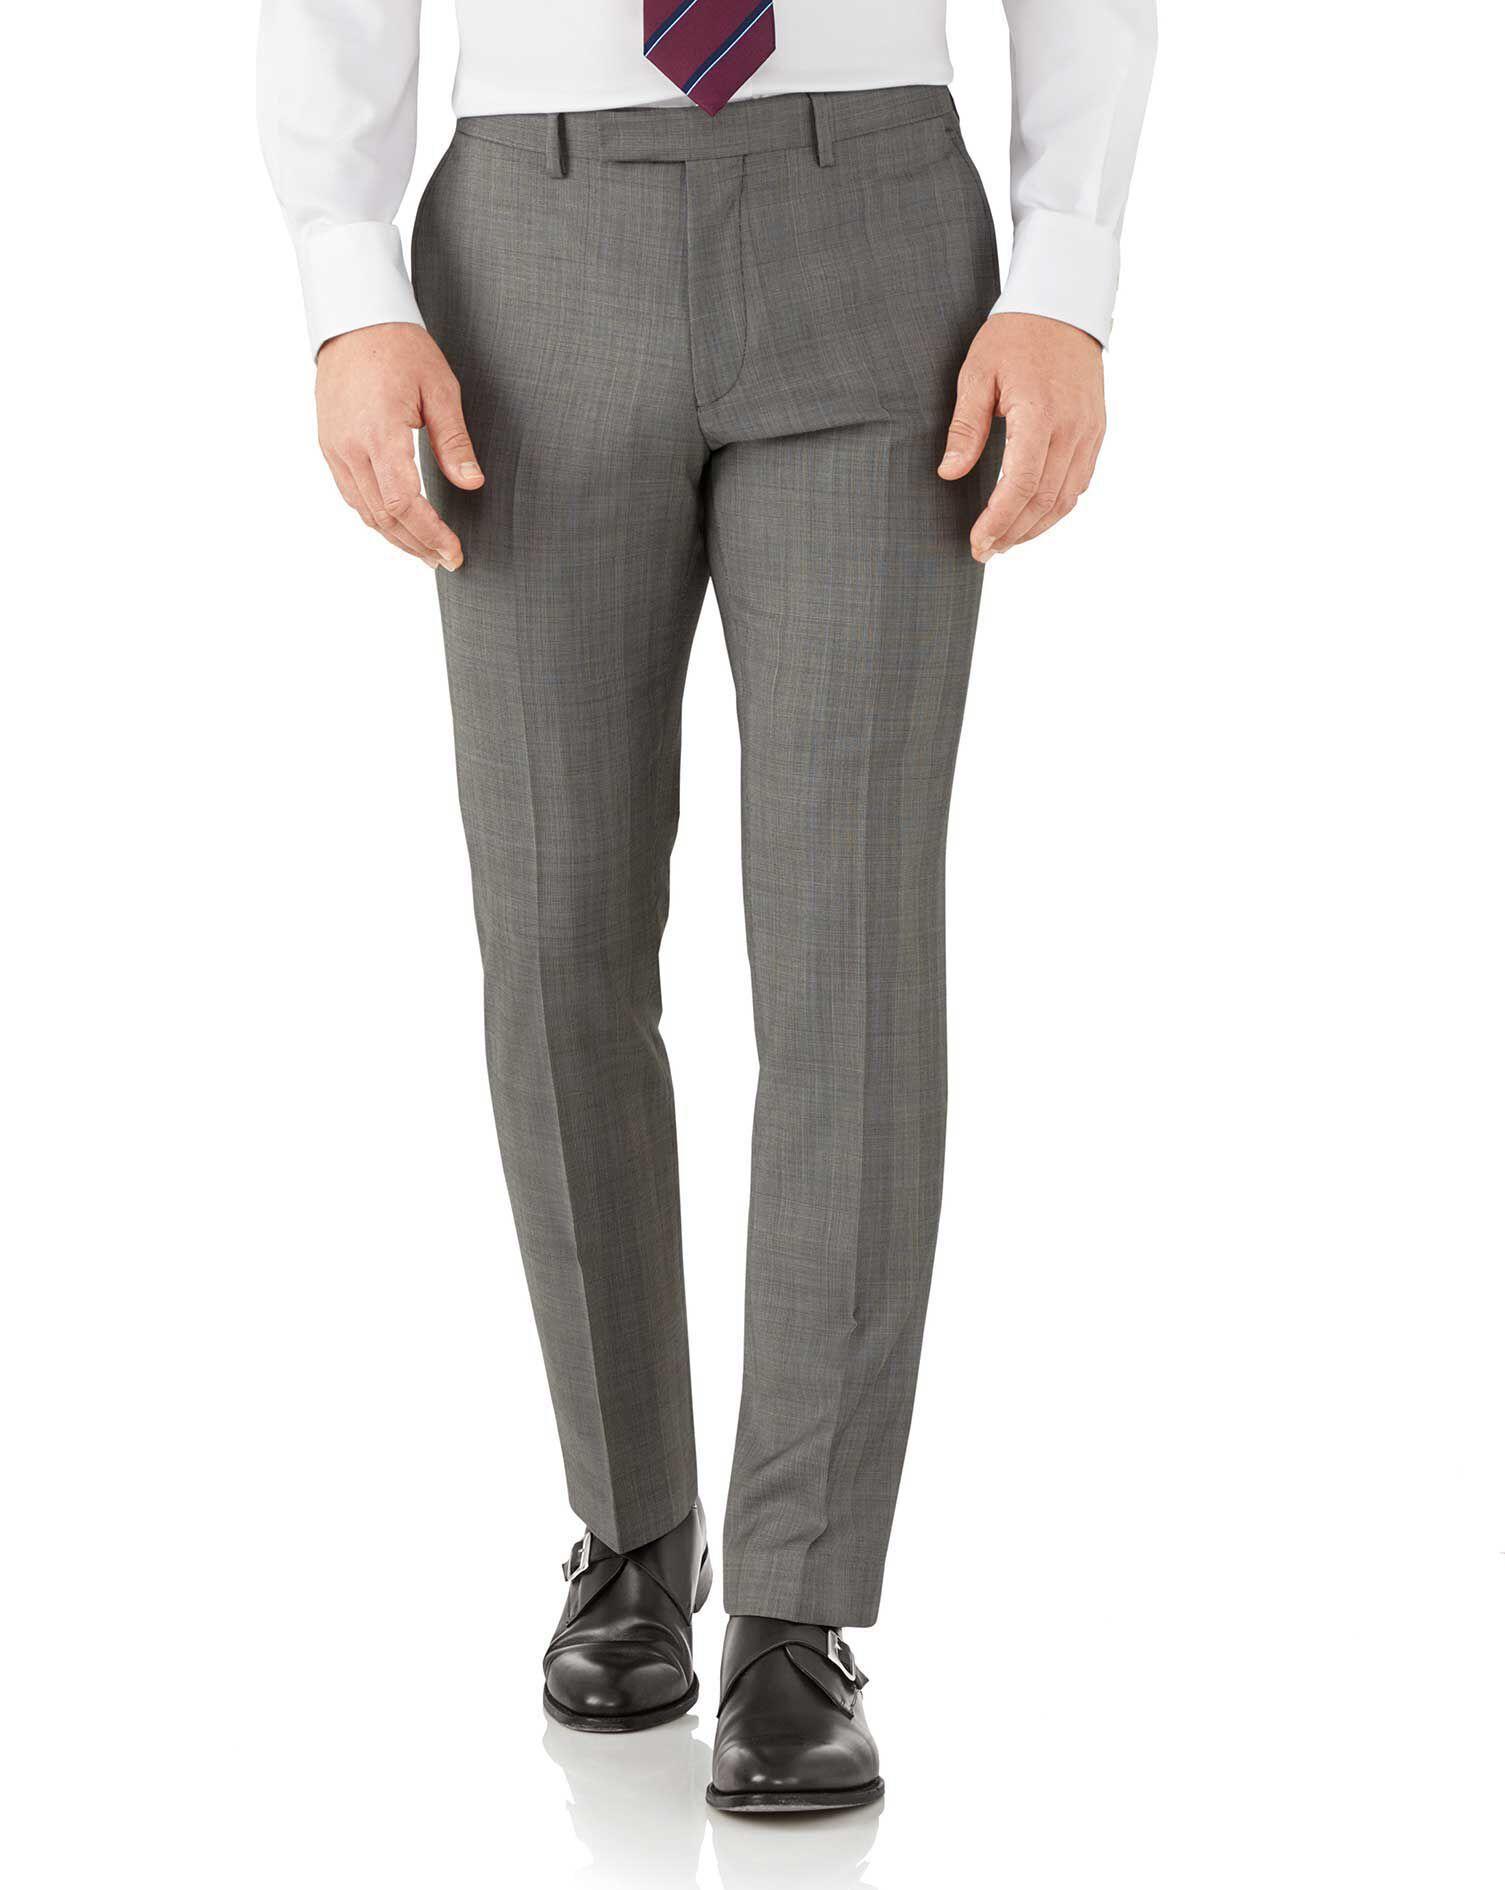 Silver Slim Fit Italian Sharkskin Luxury Check Suit Trousers Size W36 L30 by Charles Tyrwhitt